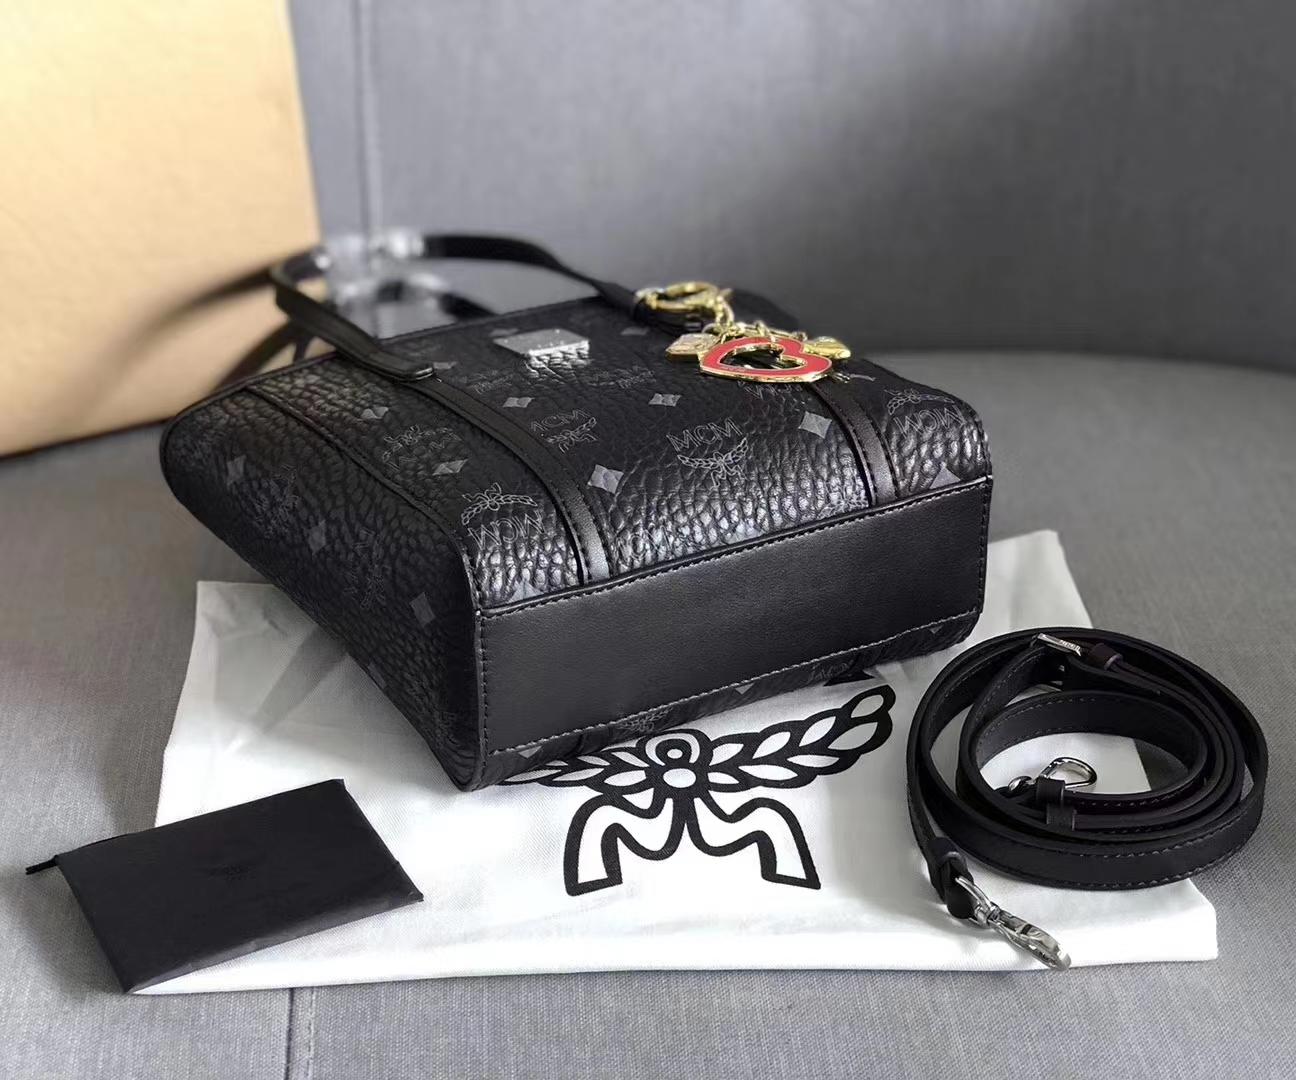 【¥450】MCM Toni Visetos新款mini购物袋 内部及外部都设计有宽敞的隔层 内部开放式口袋 皮革饰边